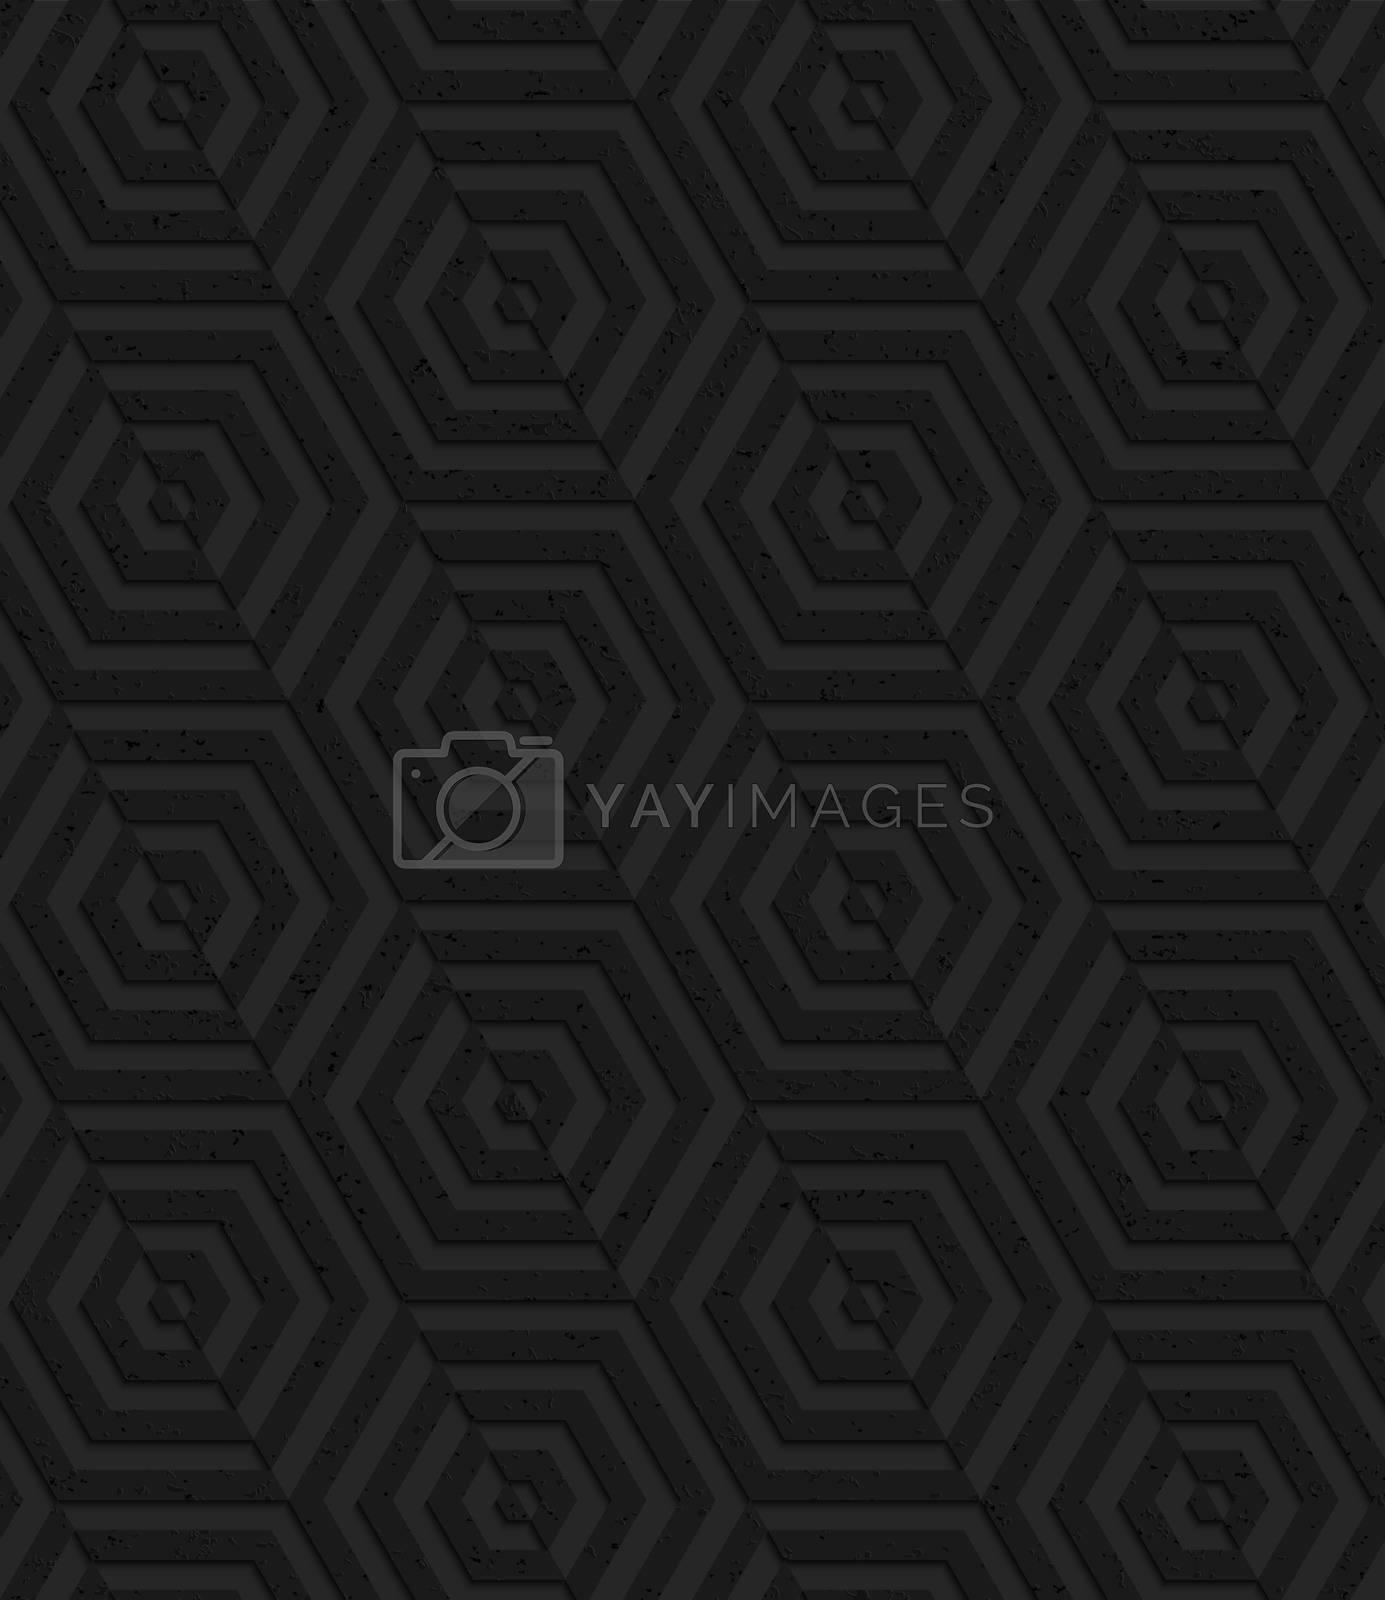 Textured black plastic diagonally cut hexagons by Zebra-Finch